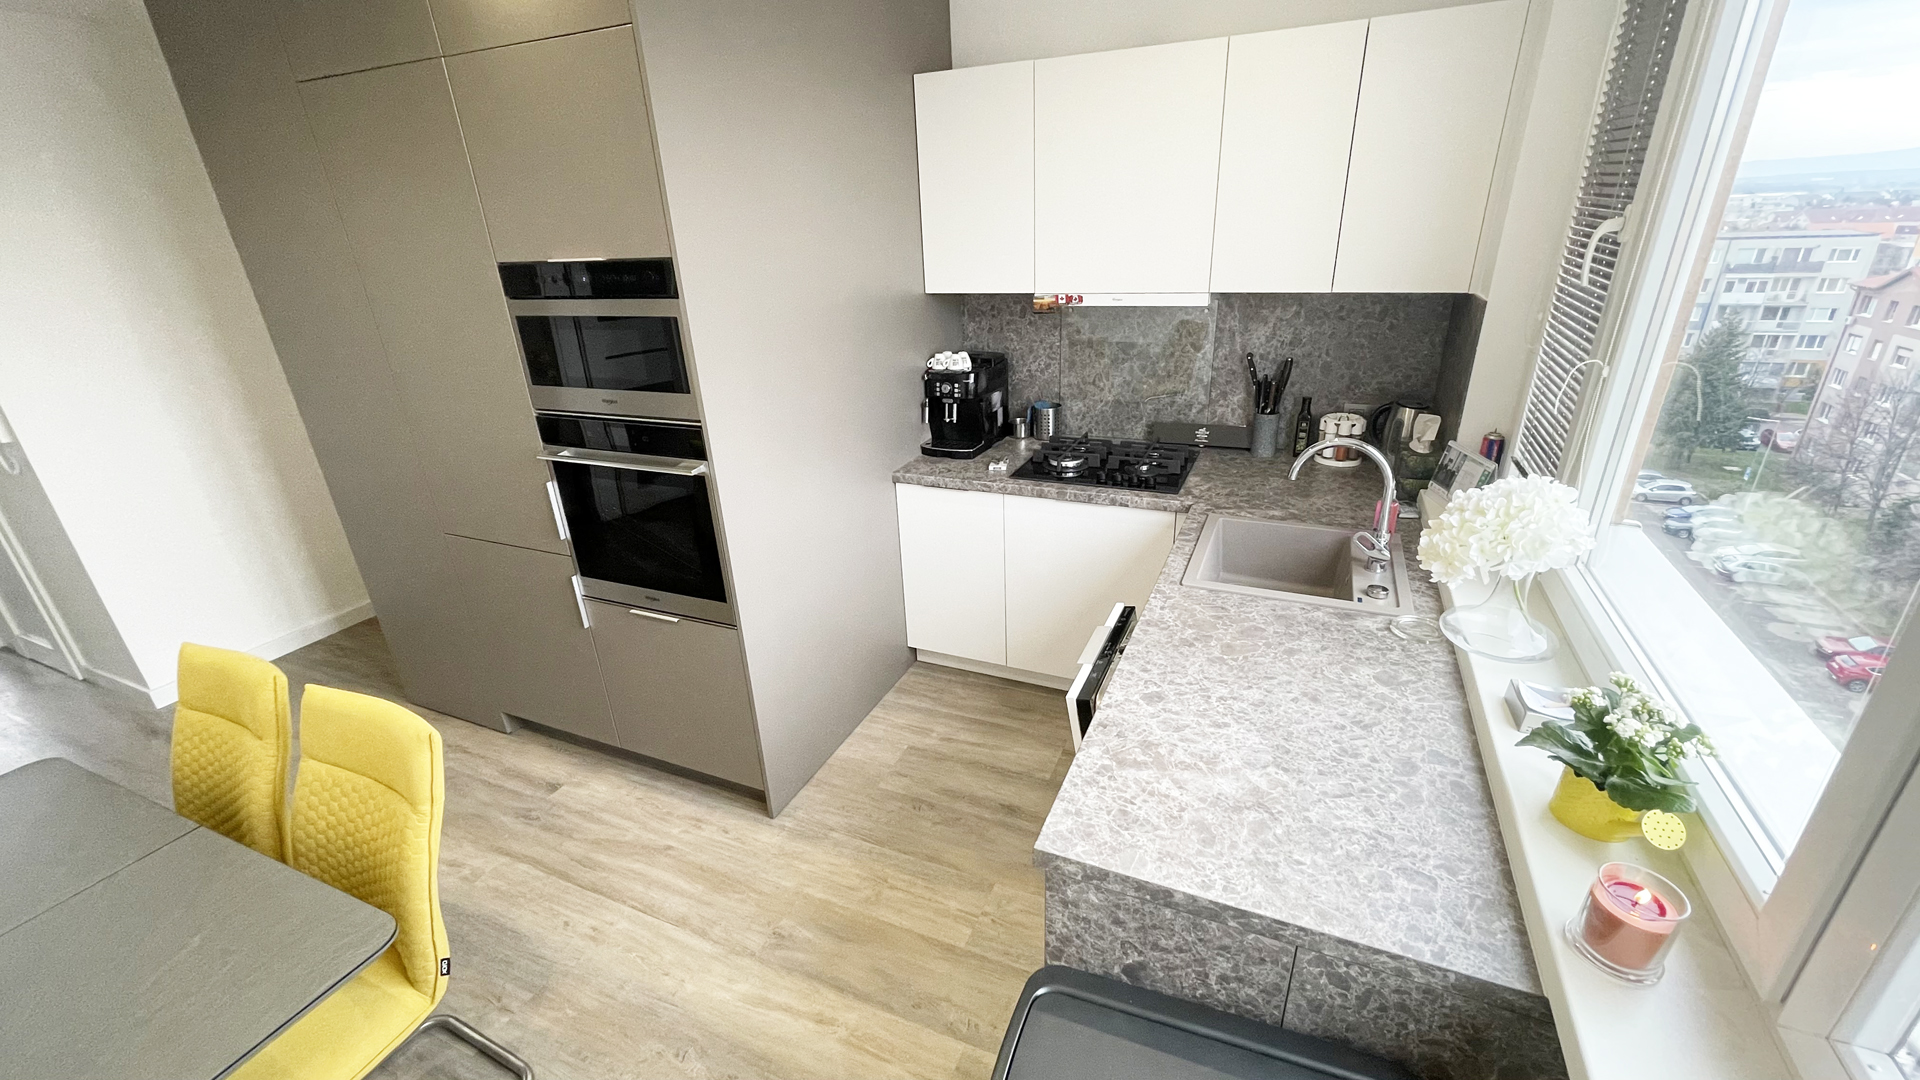 Veľmi pekný 3 izbový byt v Senci, Sokolská